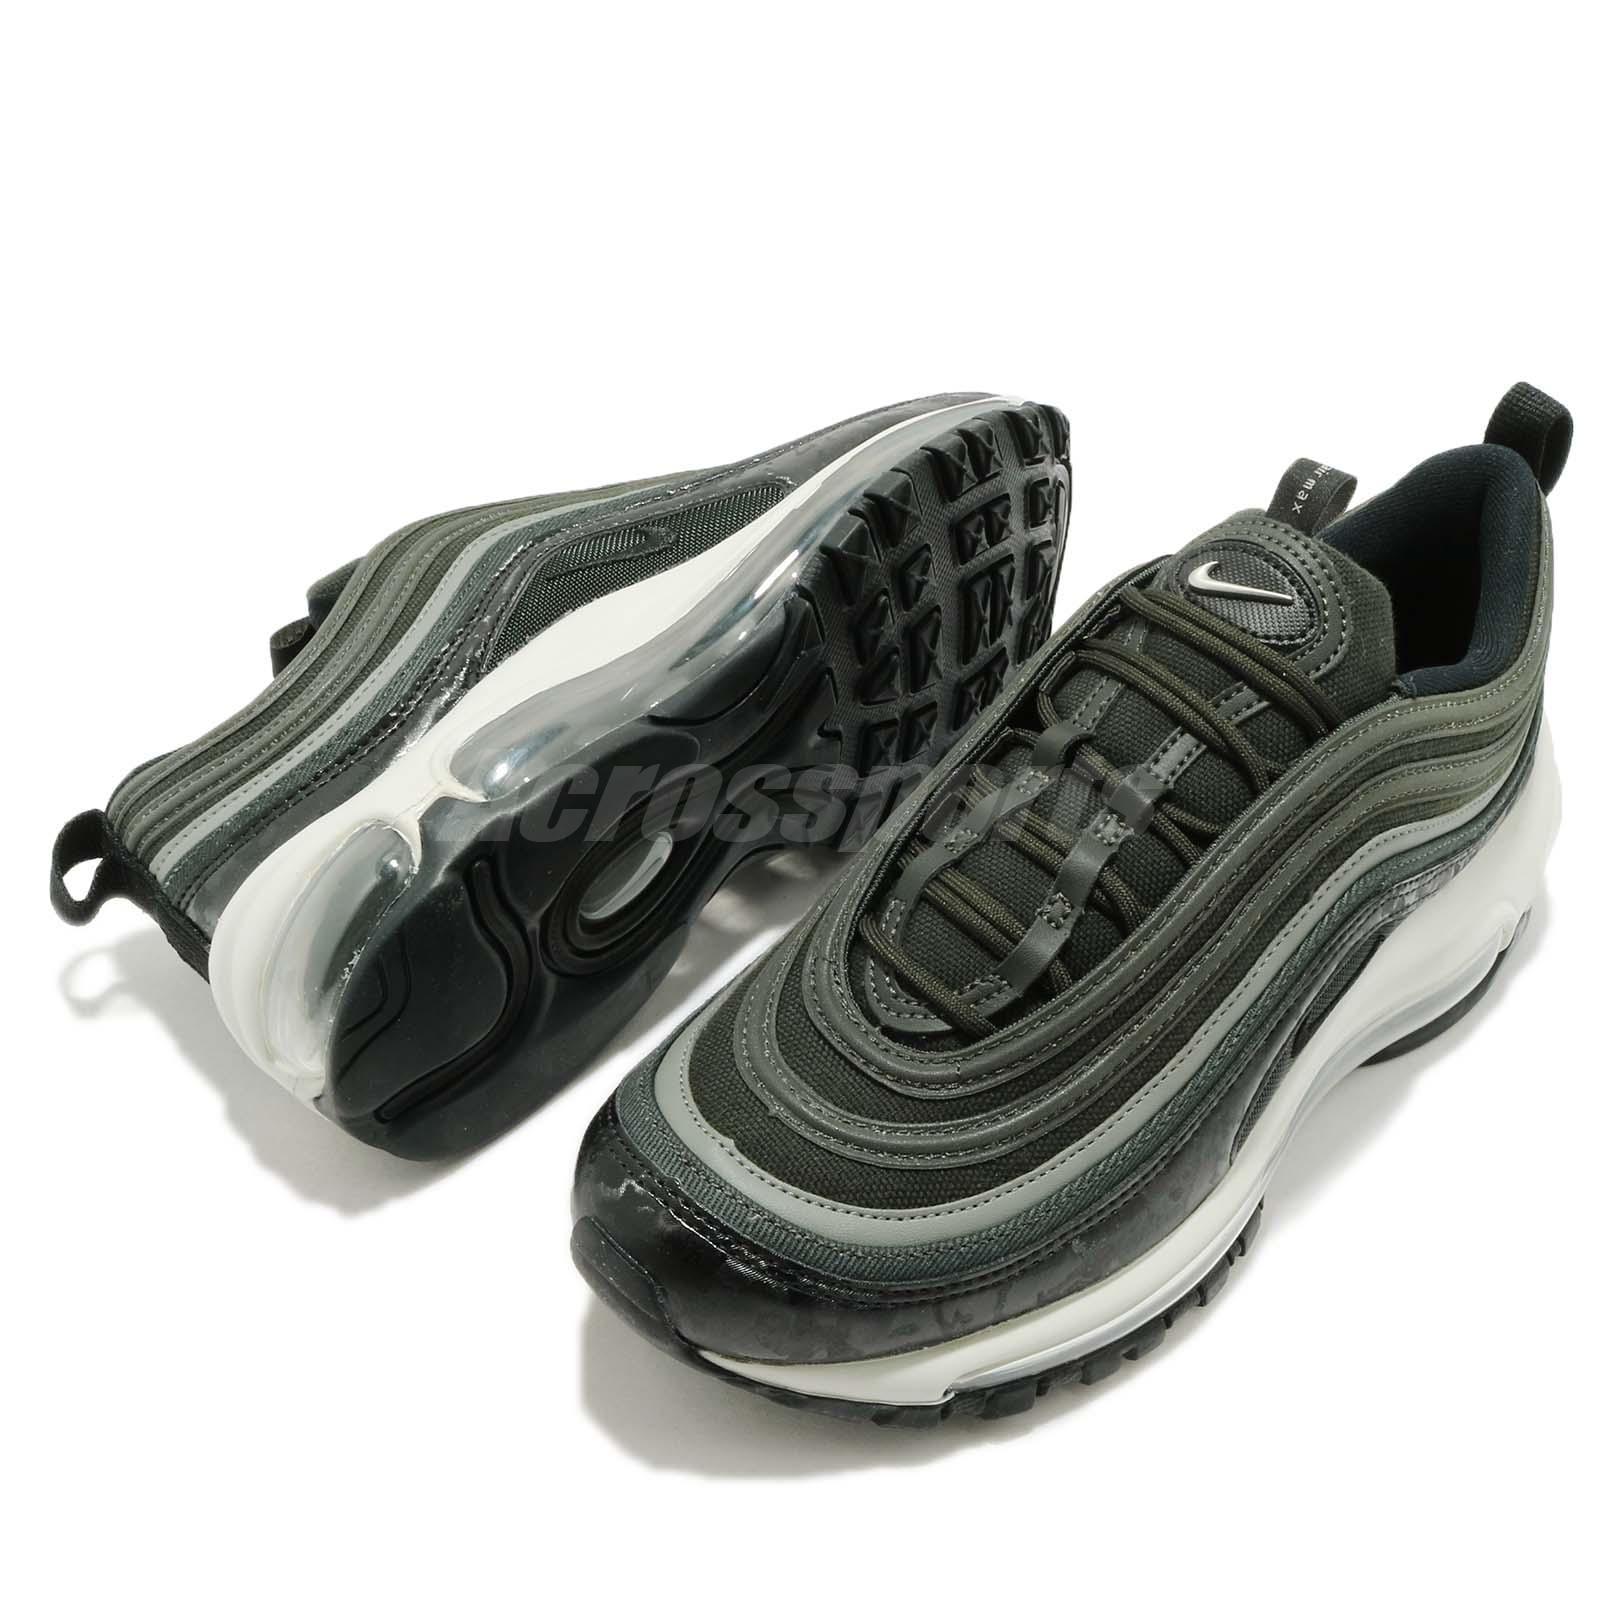 About Shoe Wmns Air Dark Prm Stucco Sequoia Green Women Details Nike 97 Running 300 Max 917646 vm8Nnw0